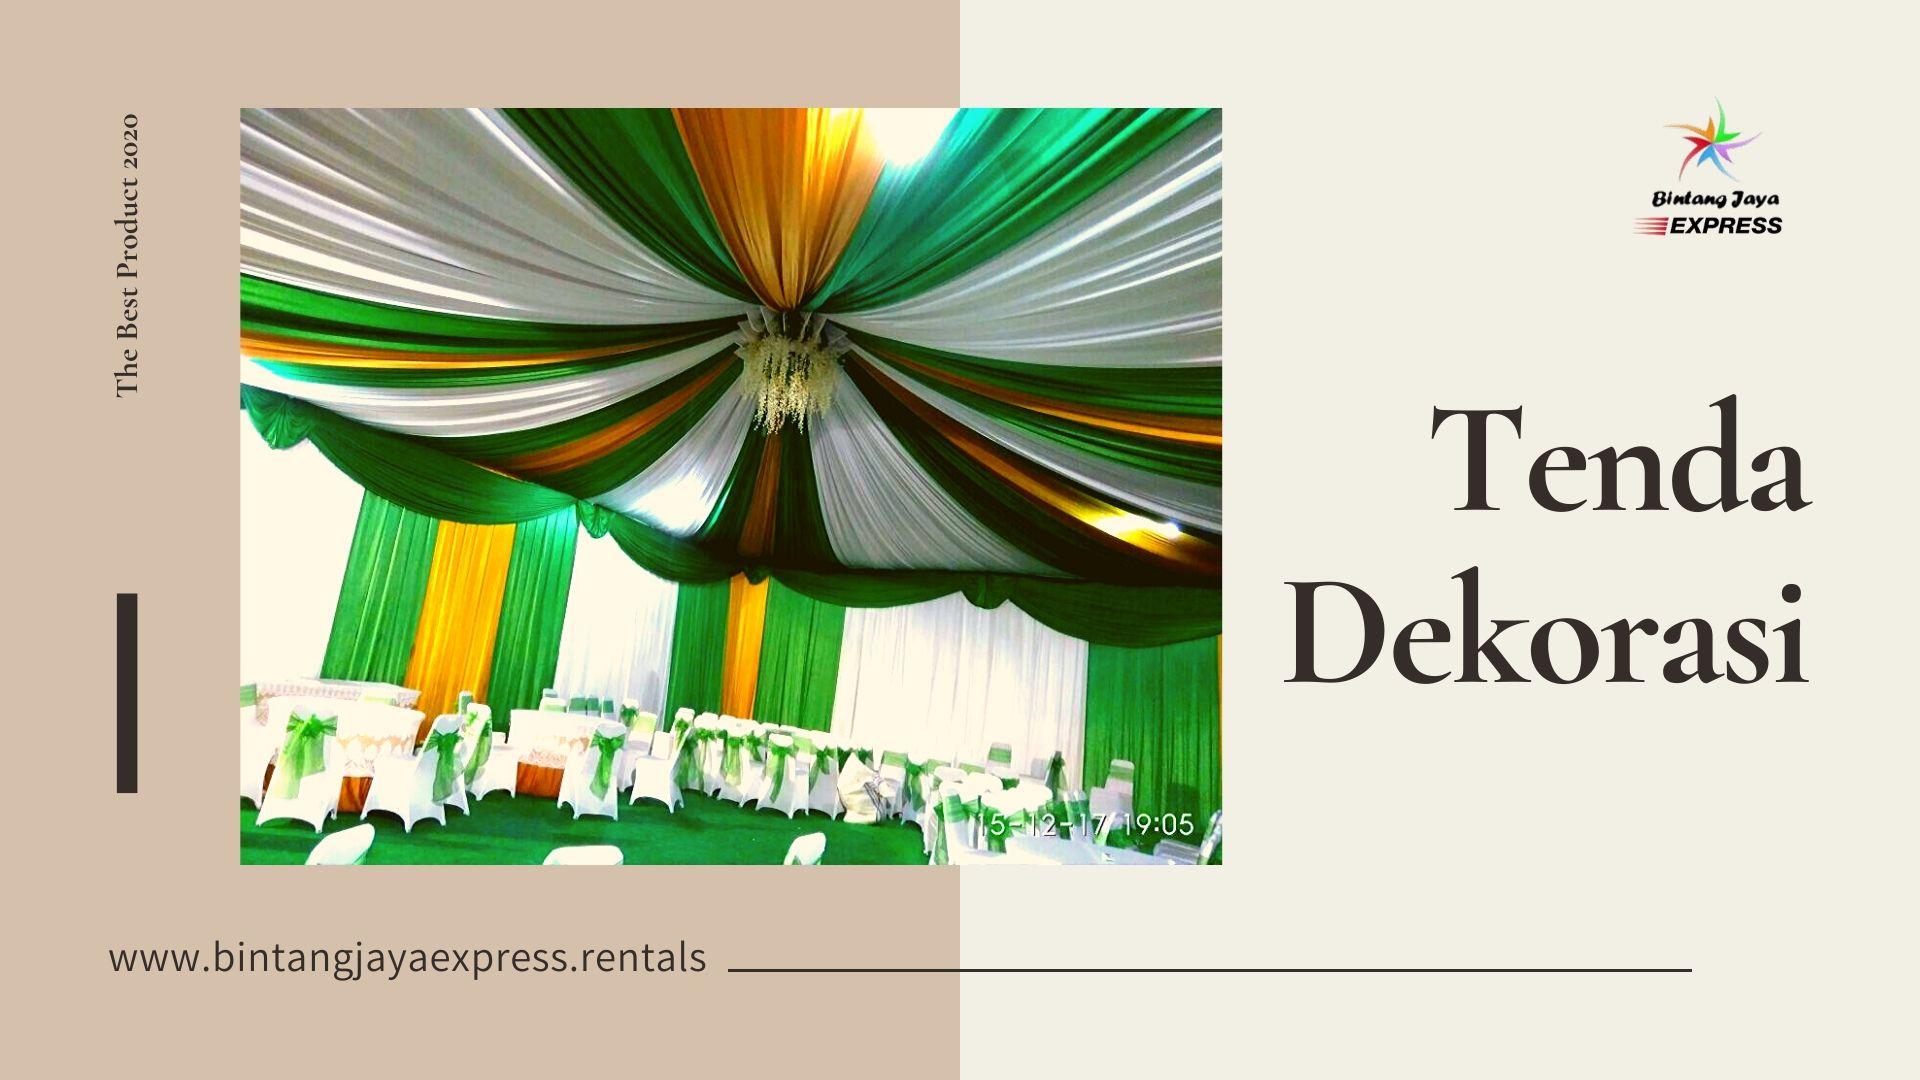 Sewa Alat Pesta Bintang Jaya Express